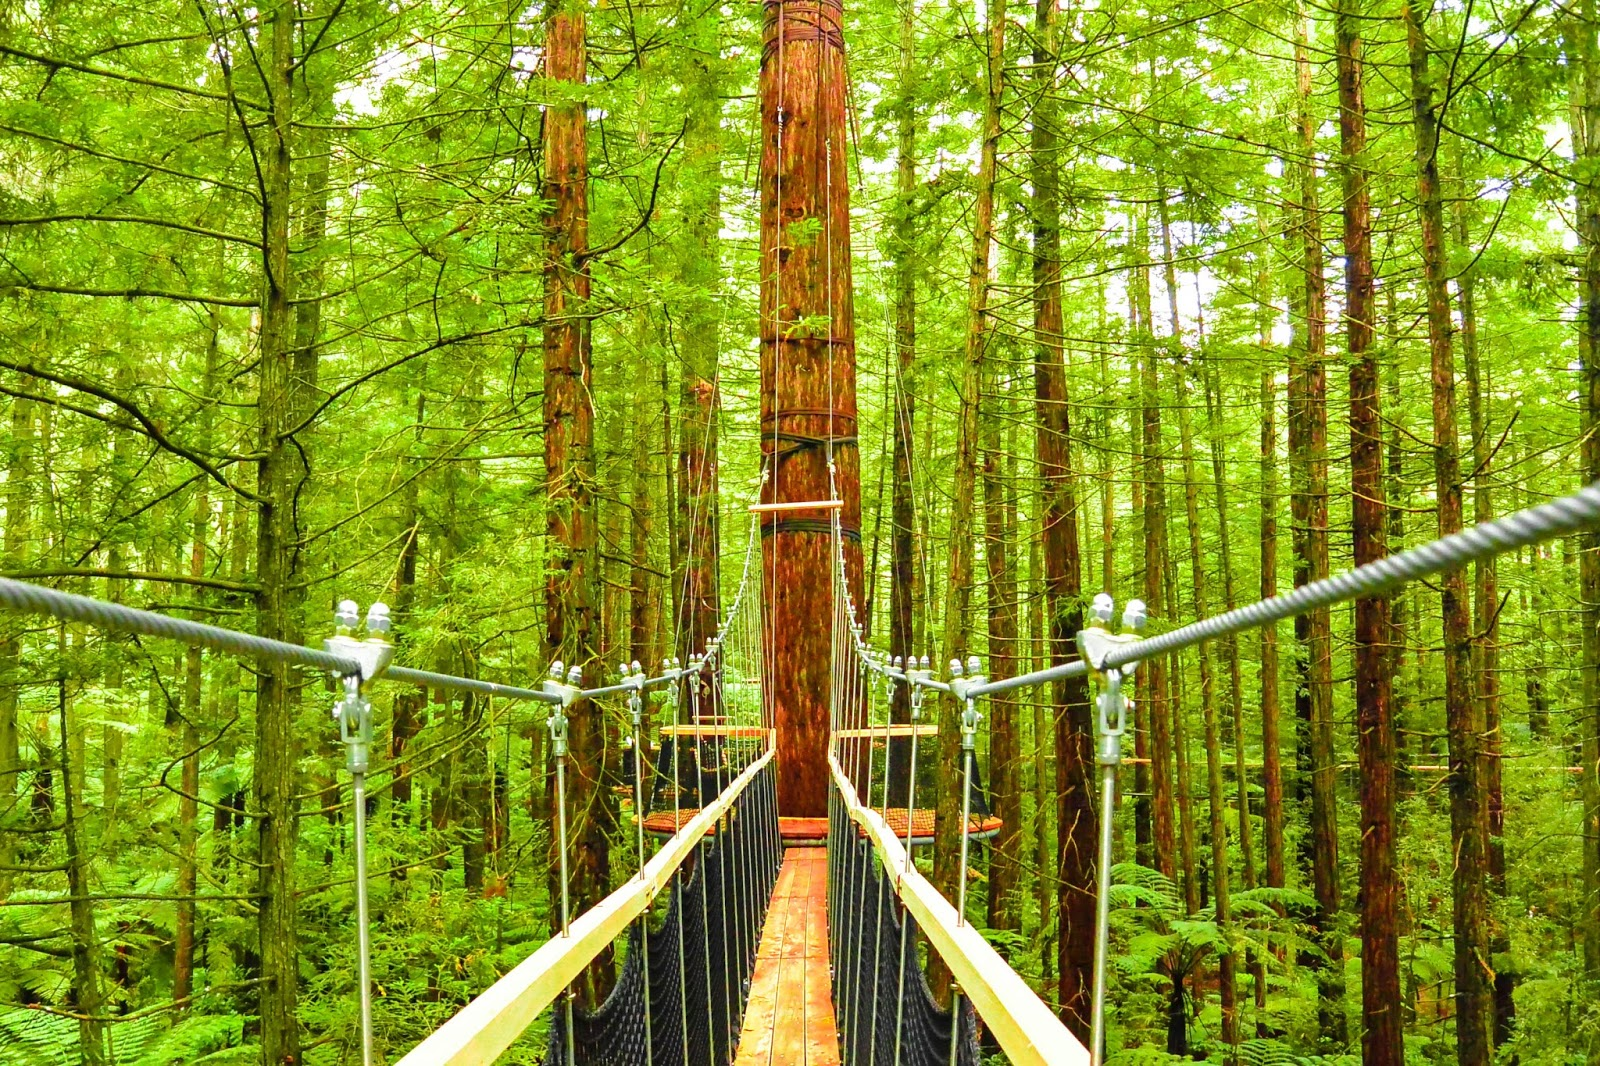 Things to do in Rotorua New Zealand : The Rotorua Redwoods TreeWalk